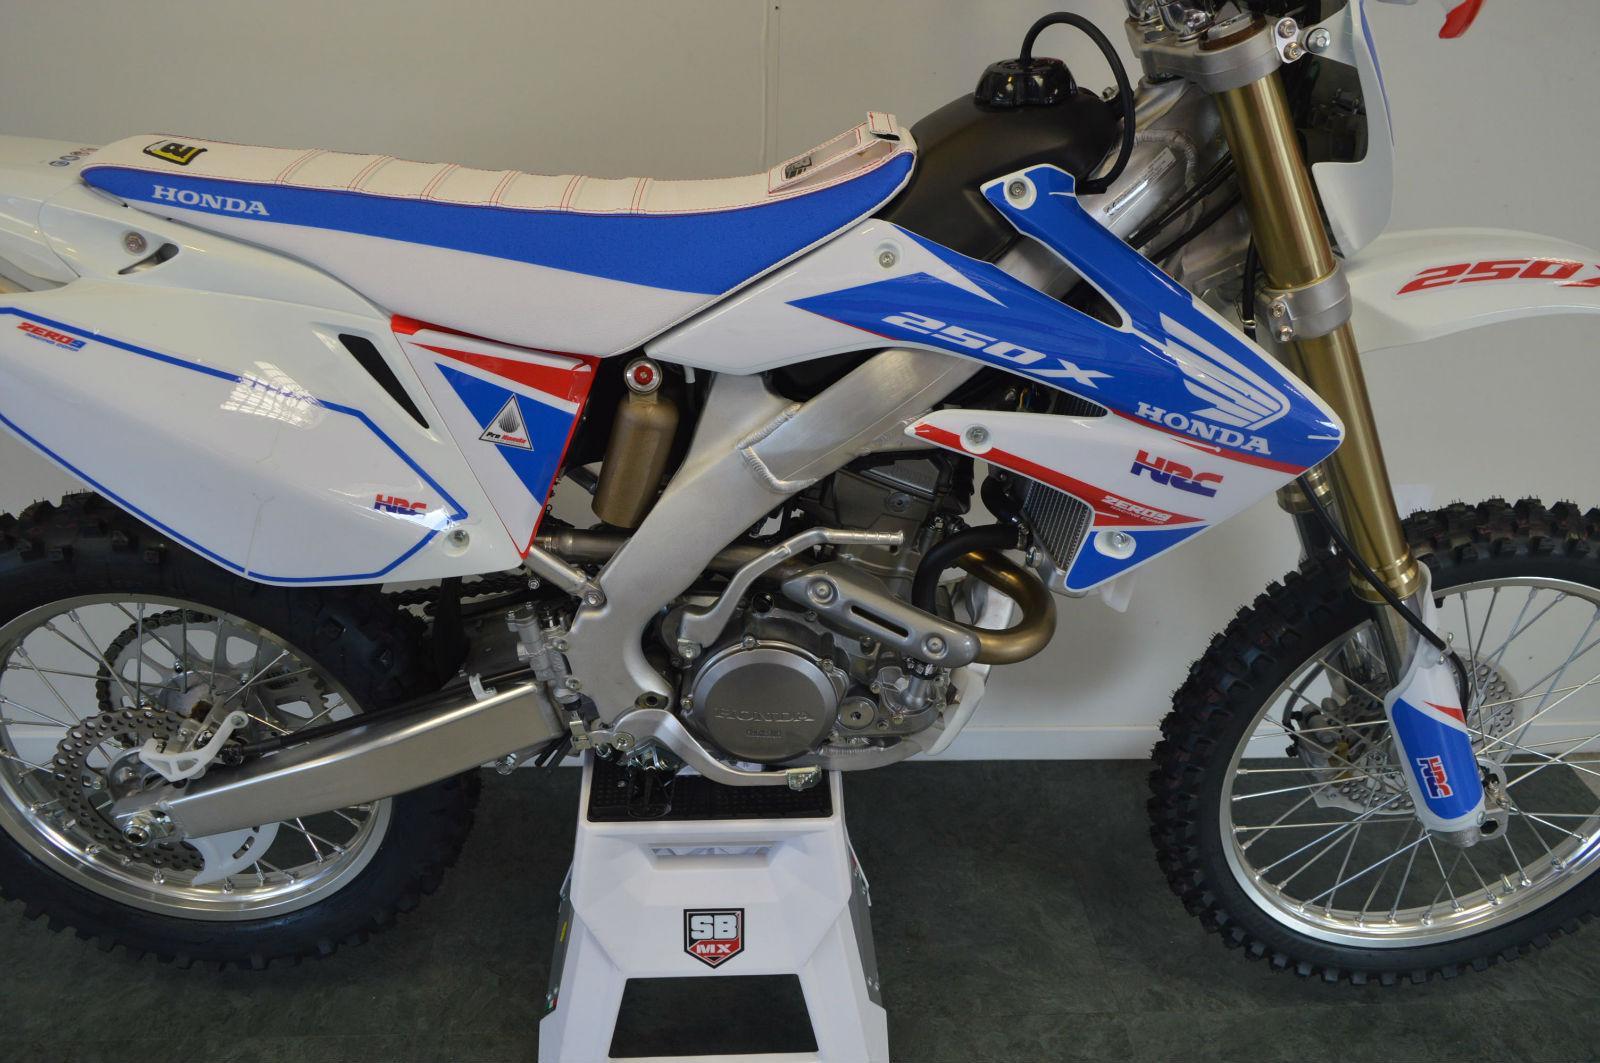 Honda 250 Dirt Bike Accessories